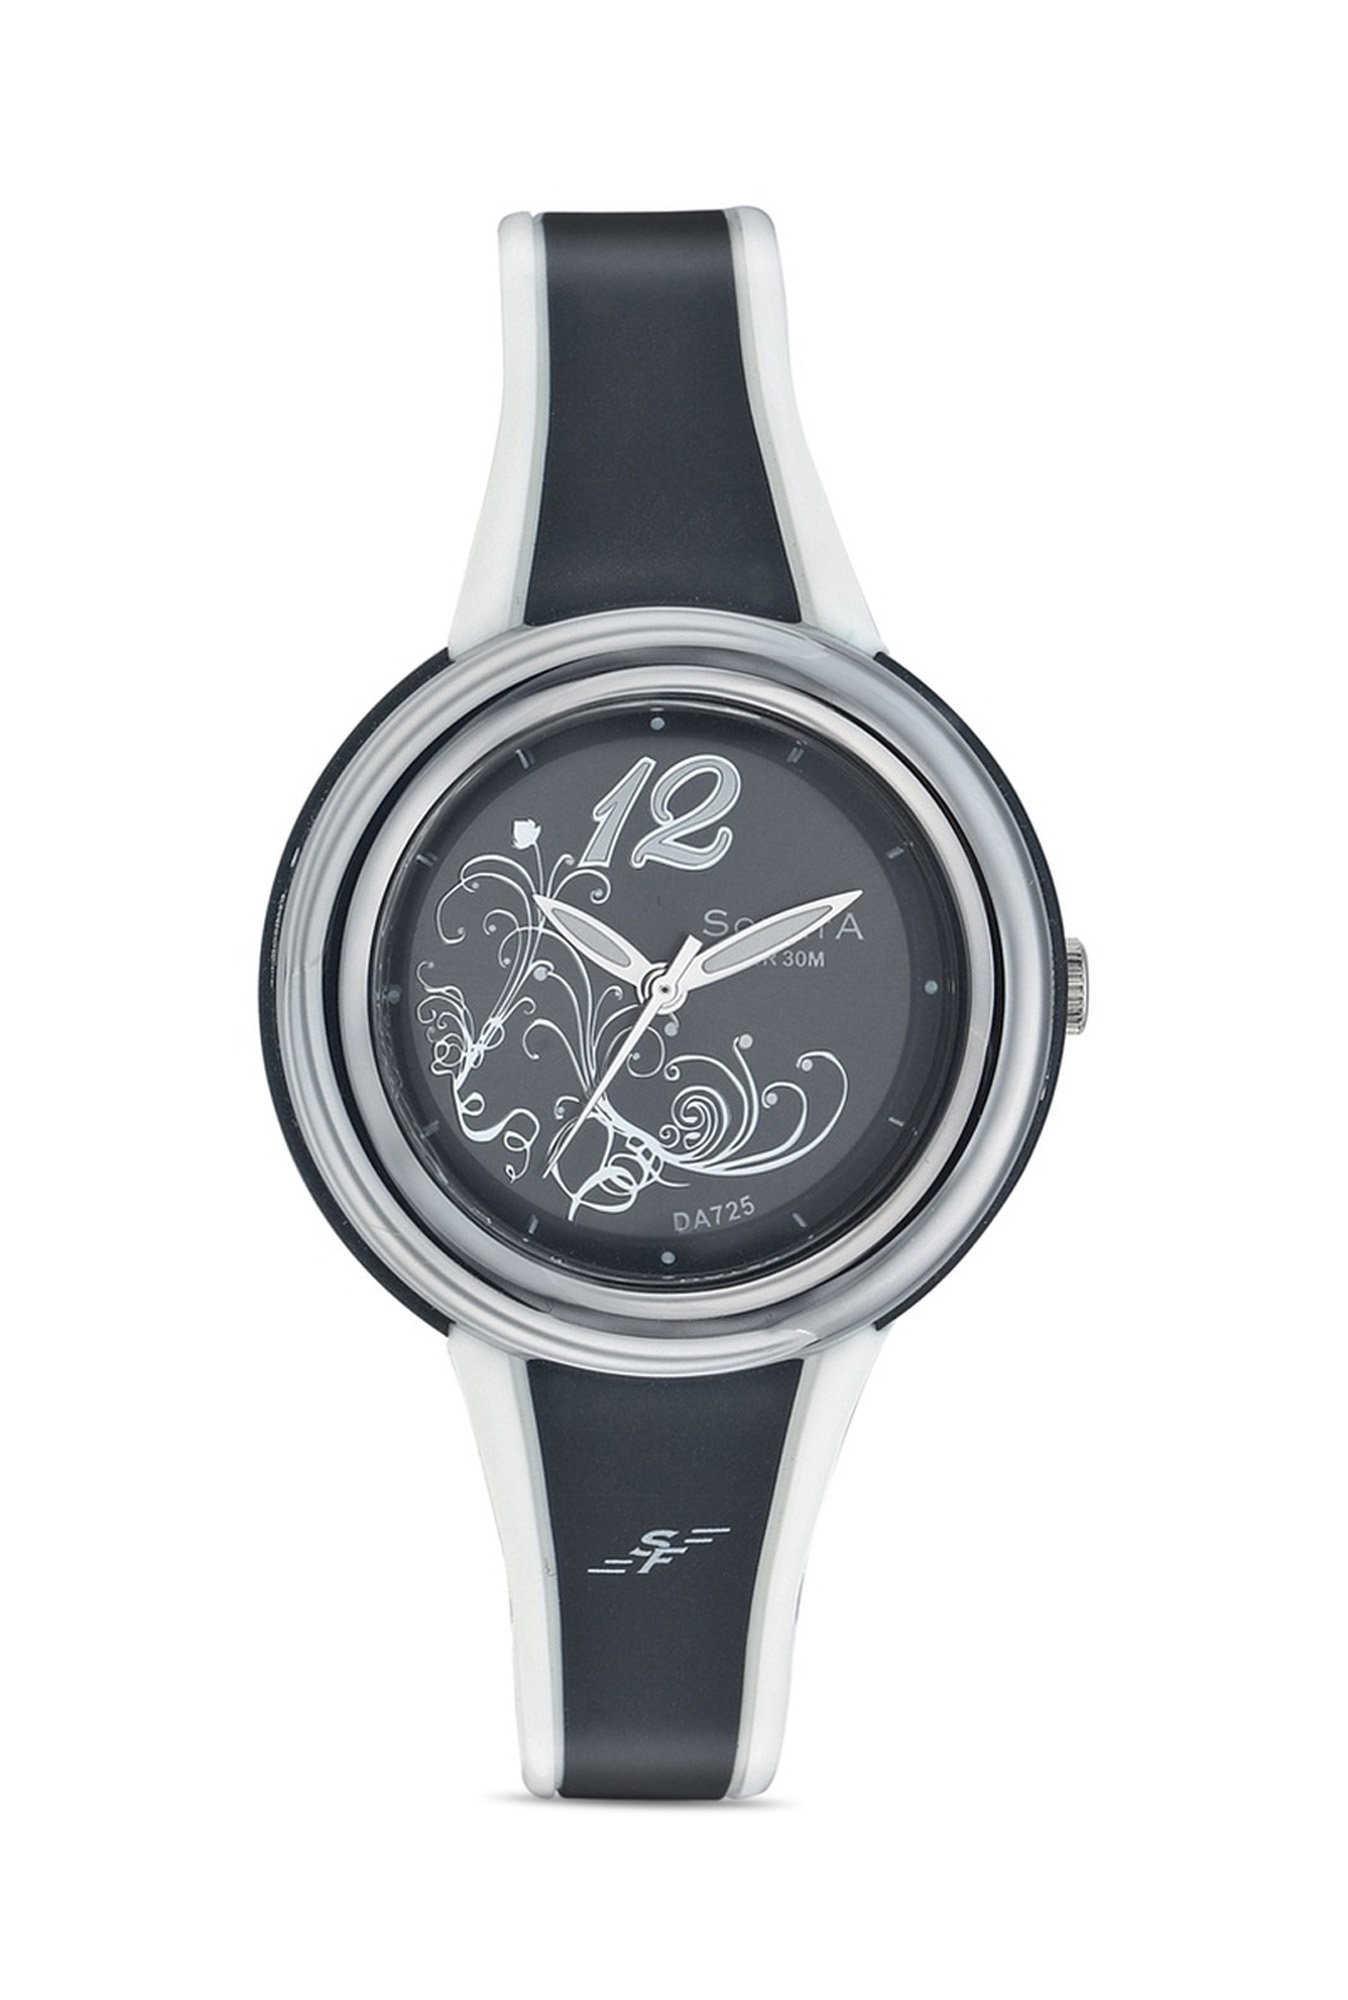 Sonata NF8962PP02J Super Fibre Analog Black Dial Women's Watch (NF8962PP02J)